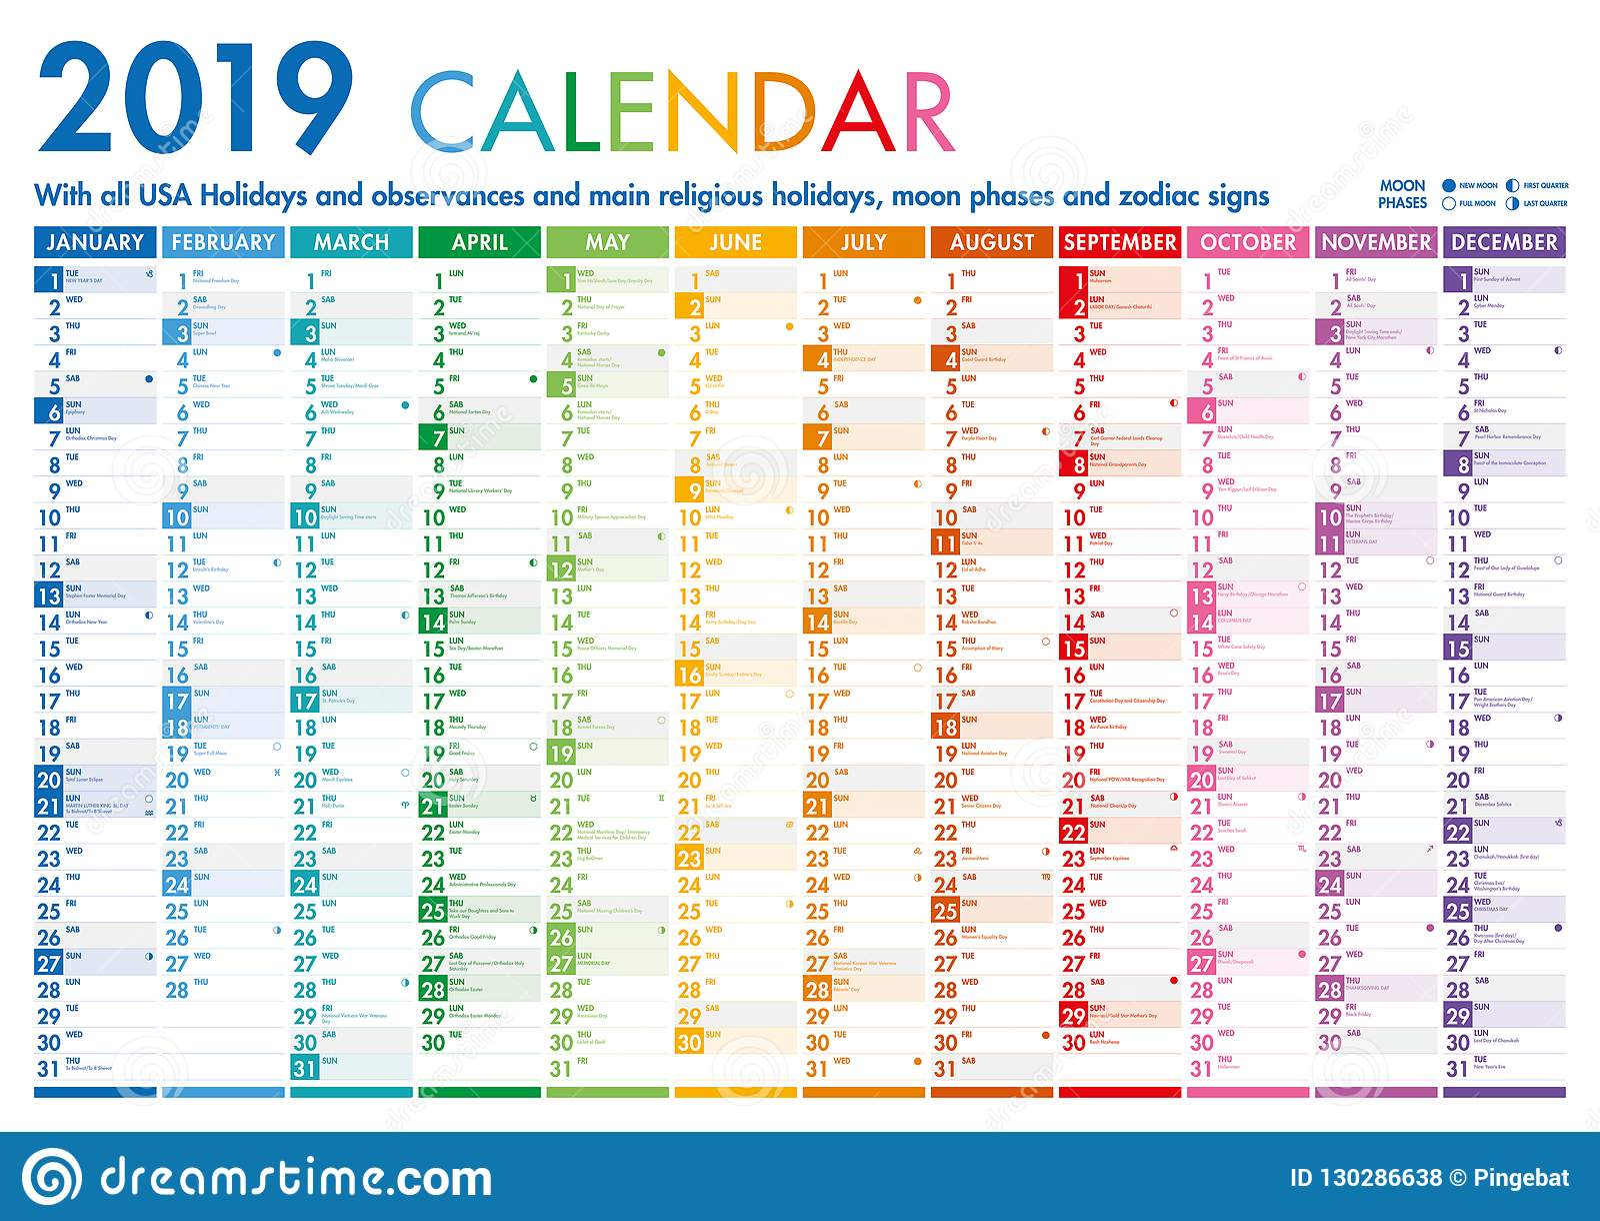 Calendario Feste.Calendario Variopinto Con Le Feste Degli Stati Uniti